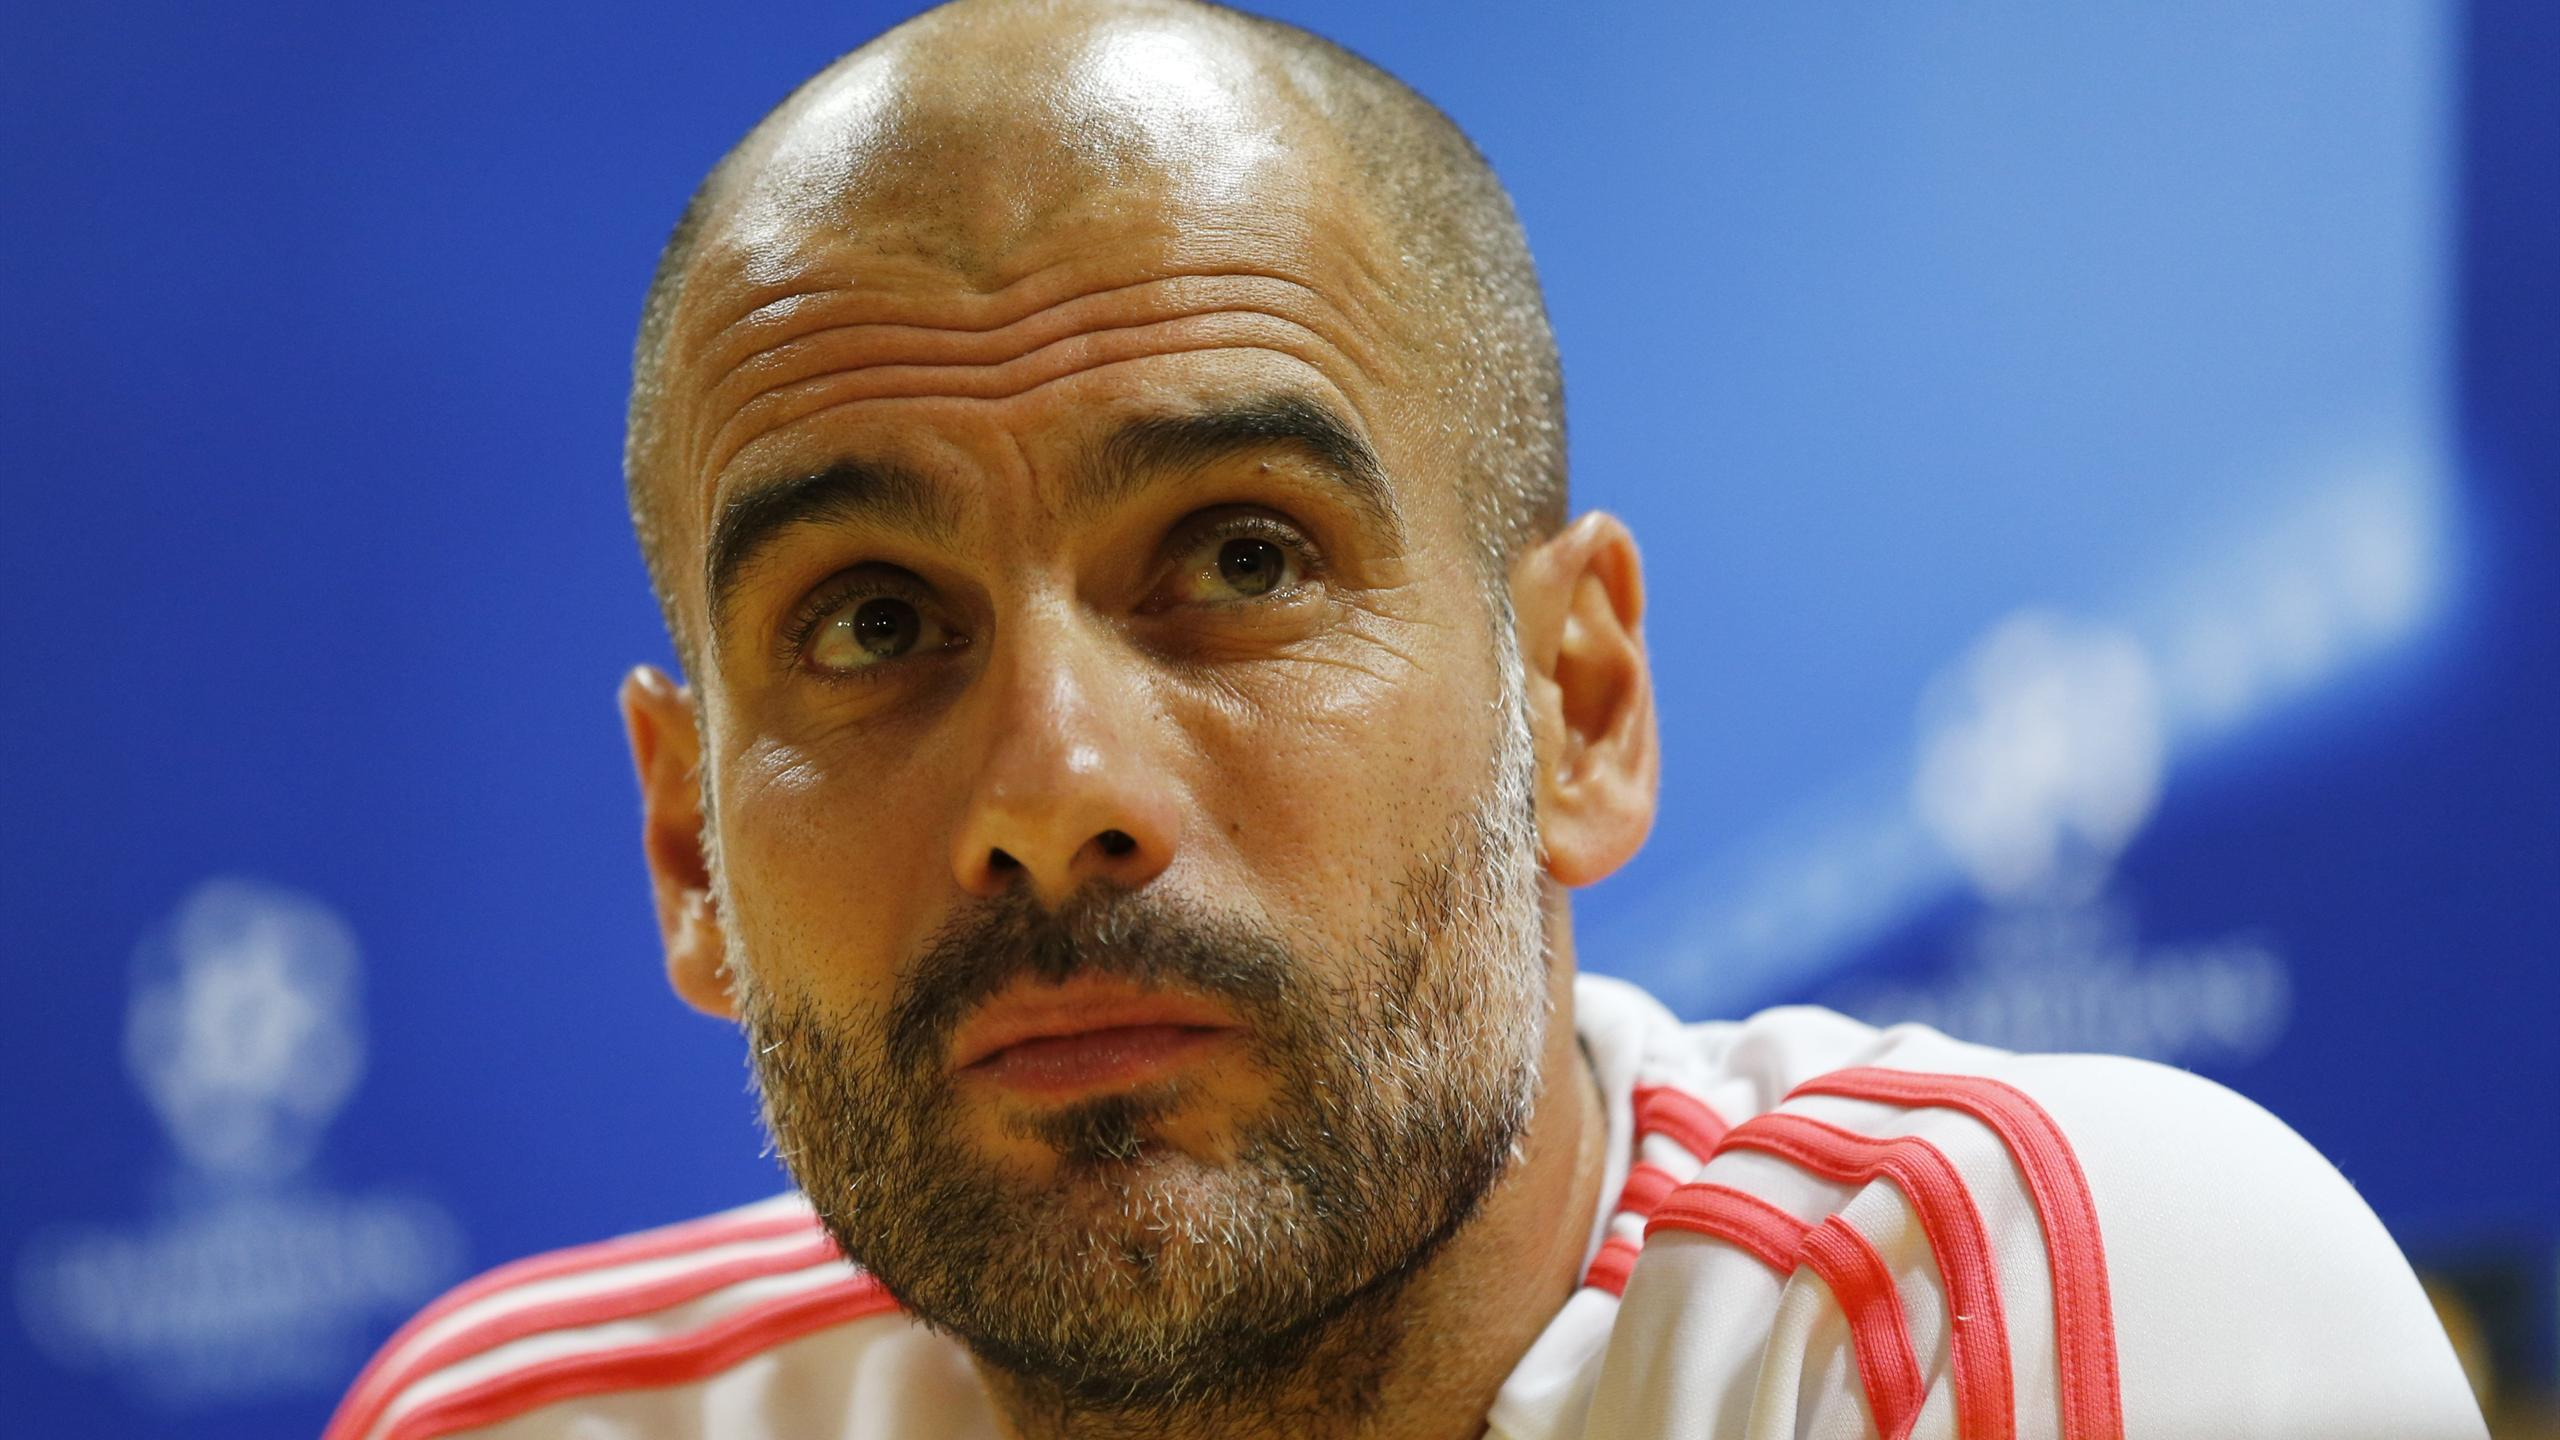 Pep Guardiola en conférence de presse